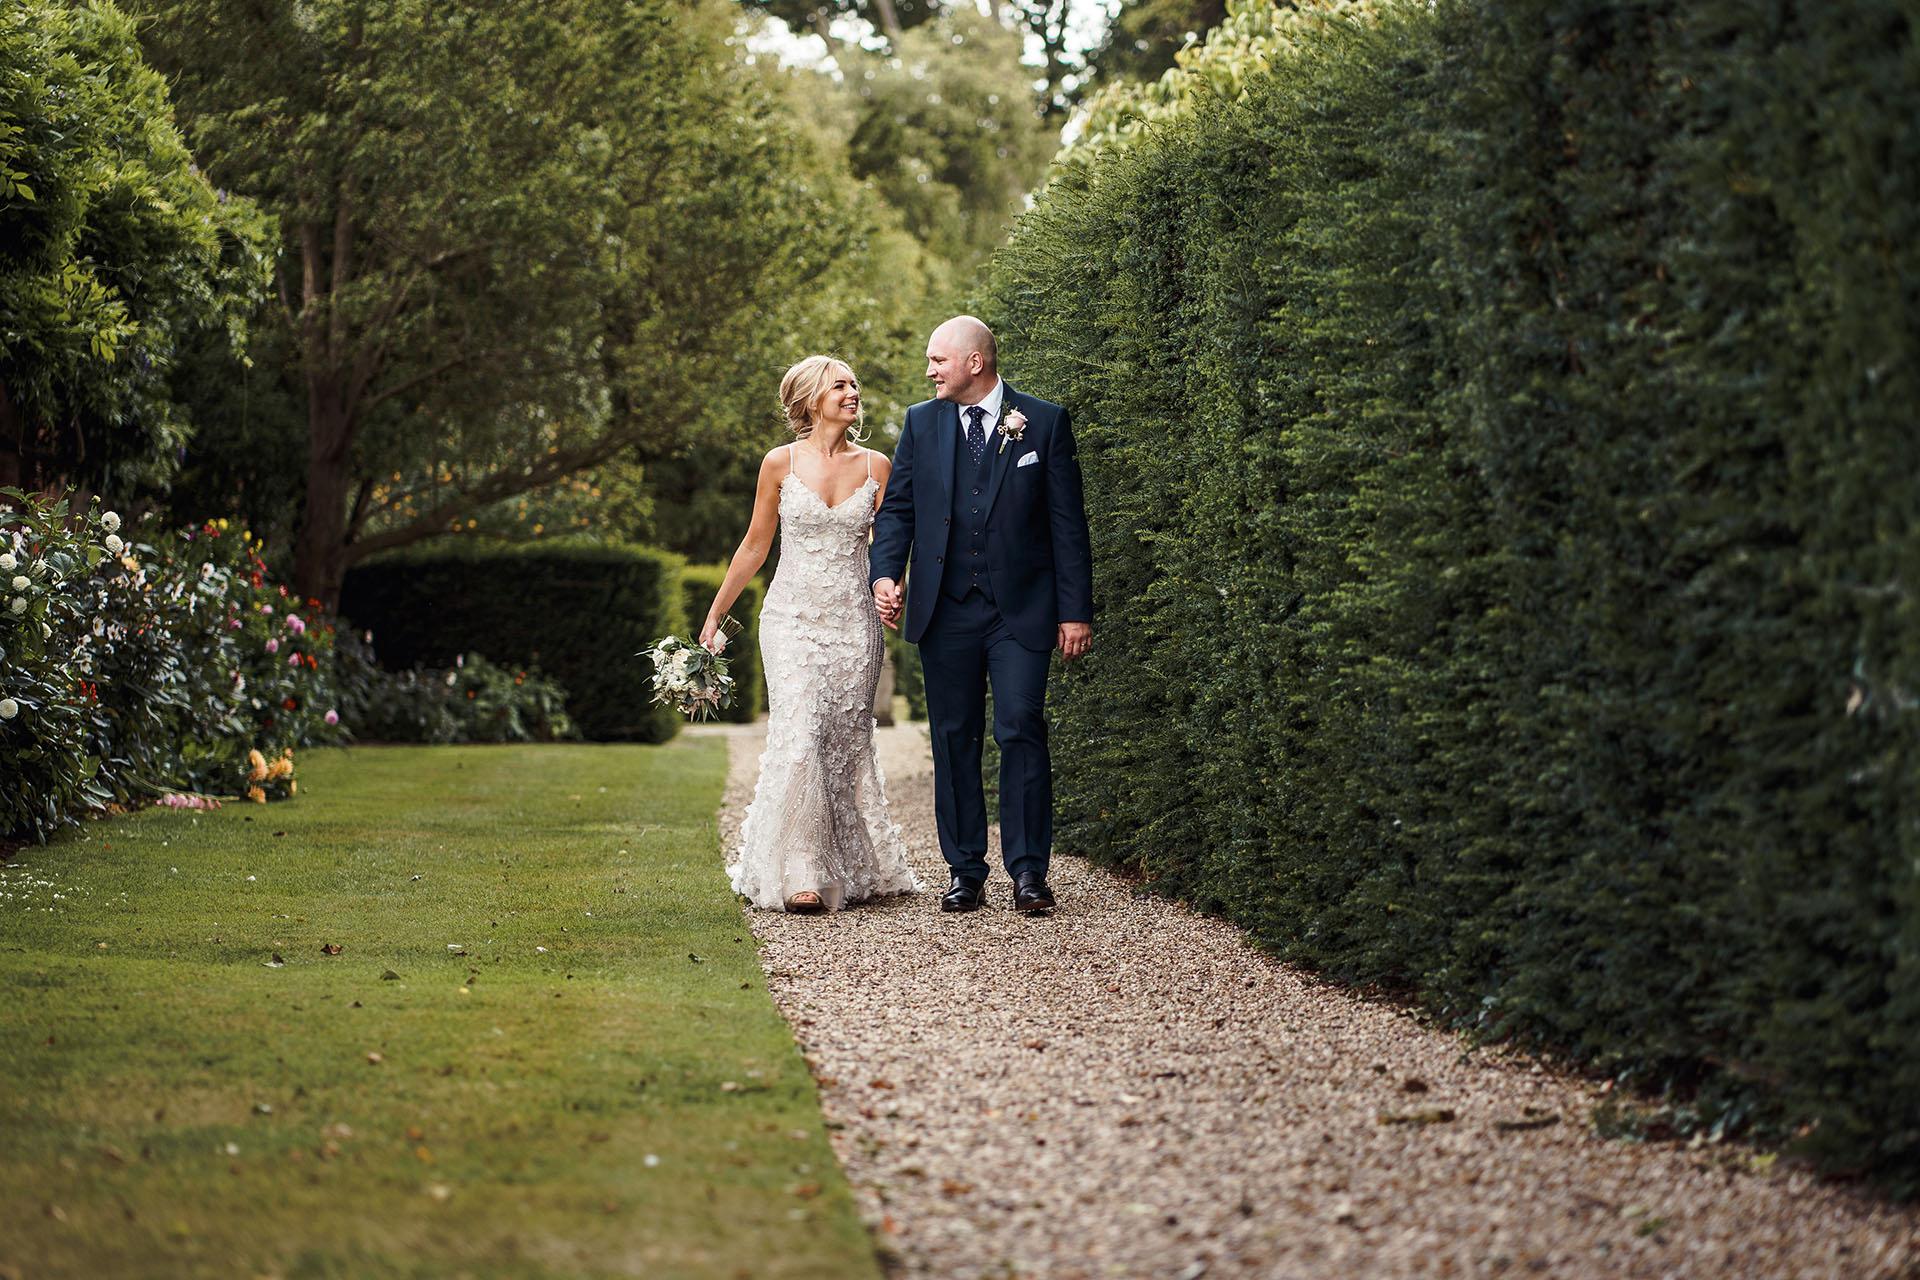 Bride and Groom walking through the gardens at Blake Hall Wedding venue